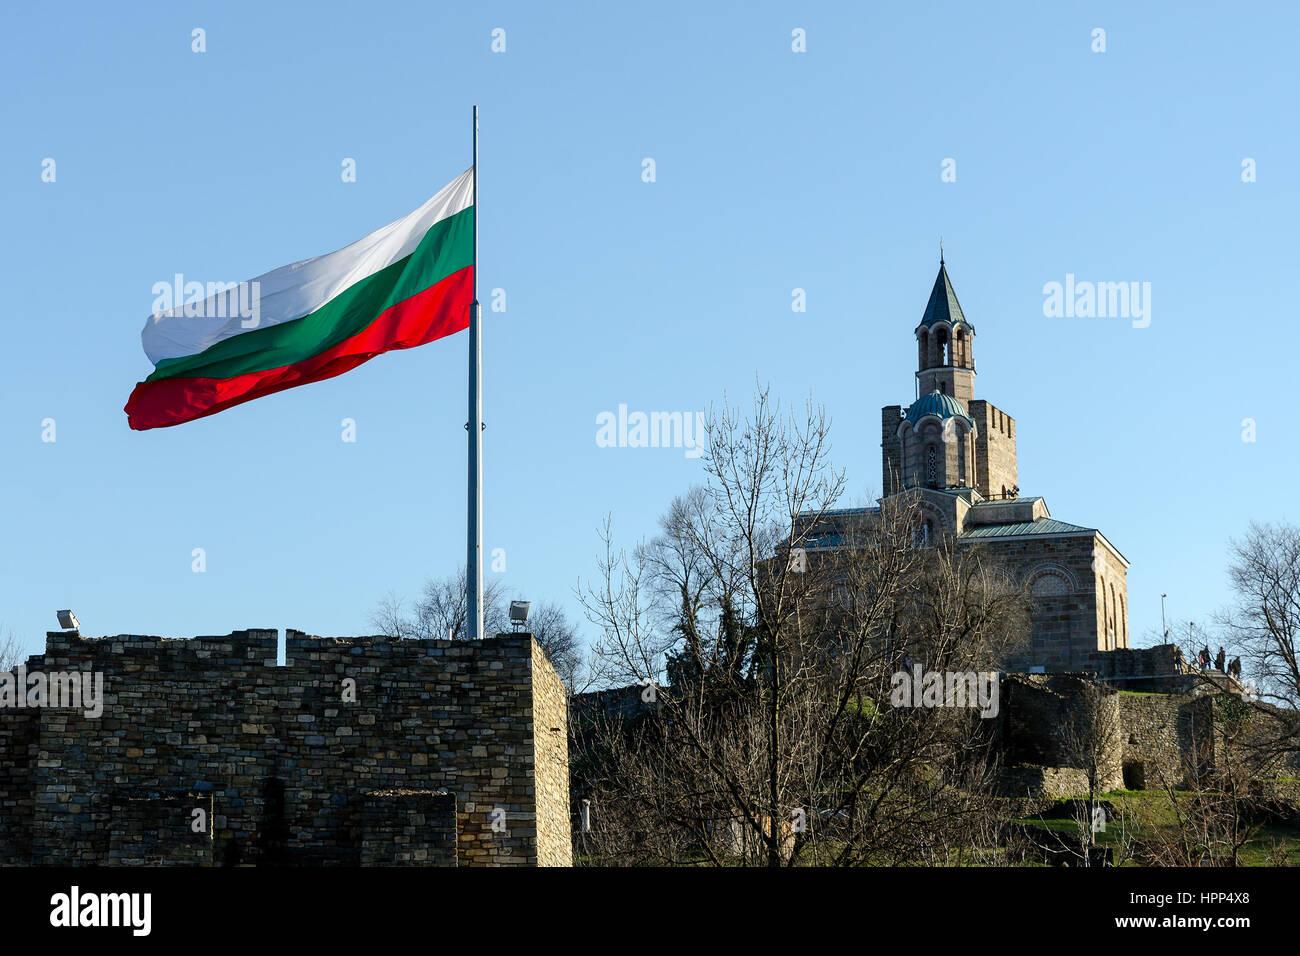 Waving Bulgarian flag at Tsarevets fortress with patriarch church in background, Veliko Tarnovo, Bulgaria Stock Photo